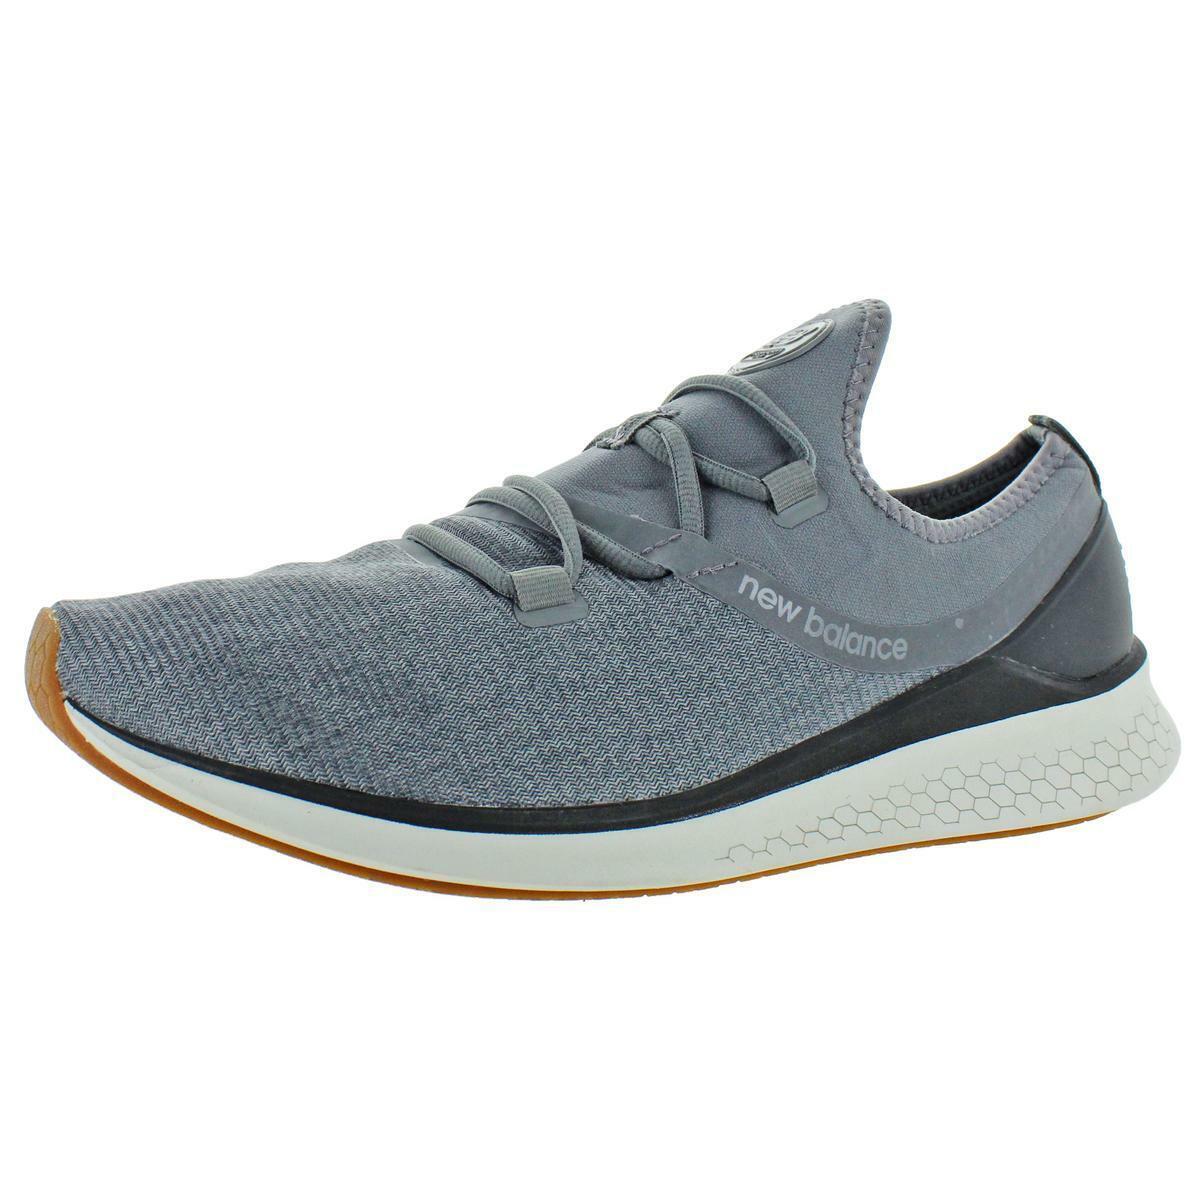 New Balance para Hombres Fresh espuma lazr Atlético Running Zapatos TENIS BHFO 6093